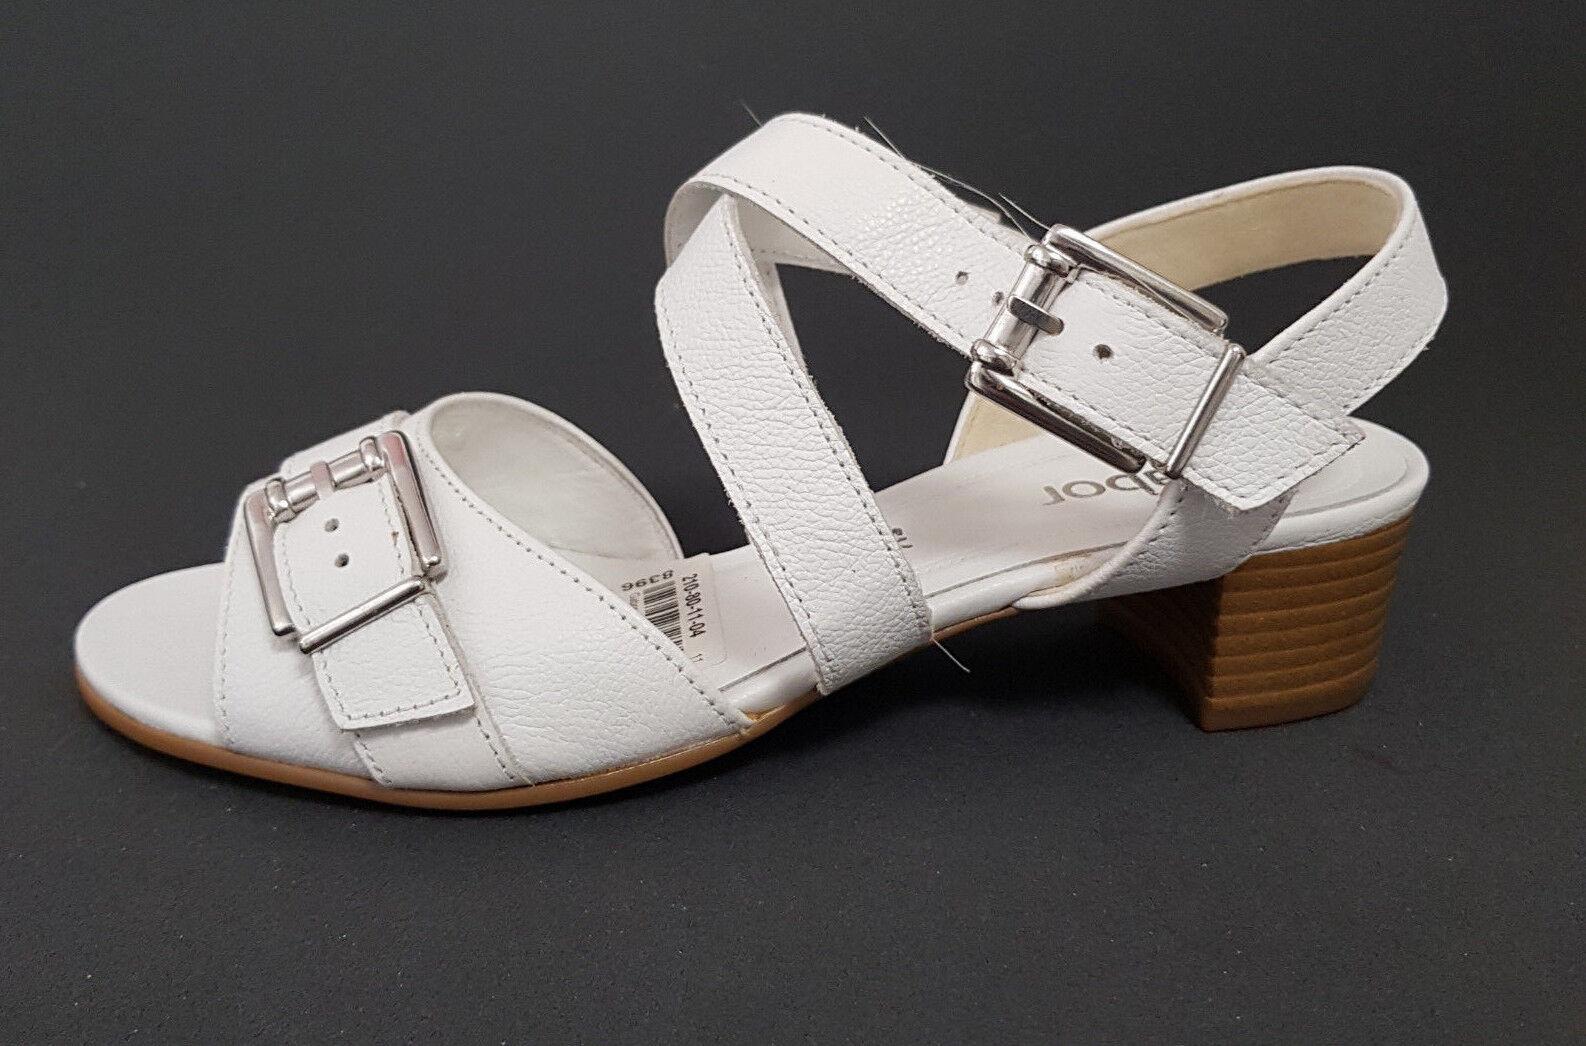 NEU   Gabor schuhe Sandale Pantolette elegante Sandalette Weiß  Leder rotUZIERT